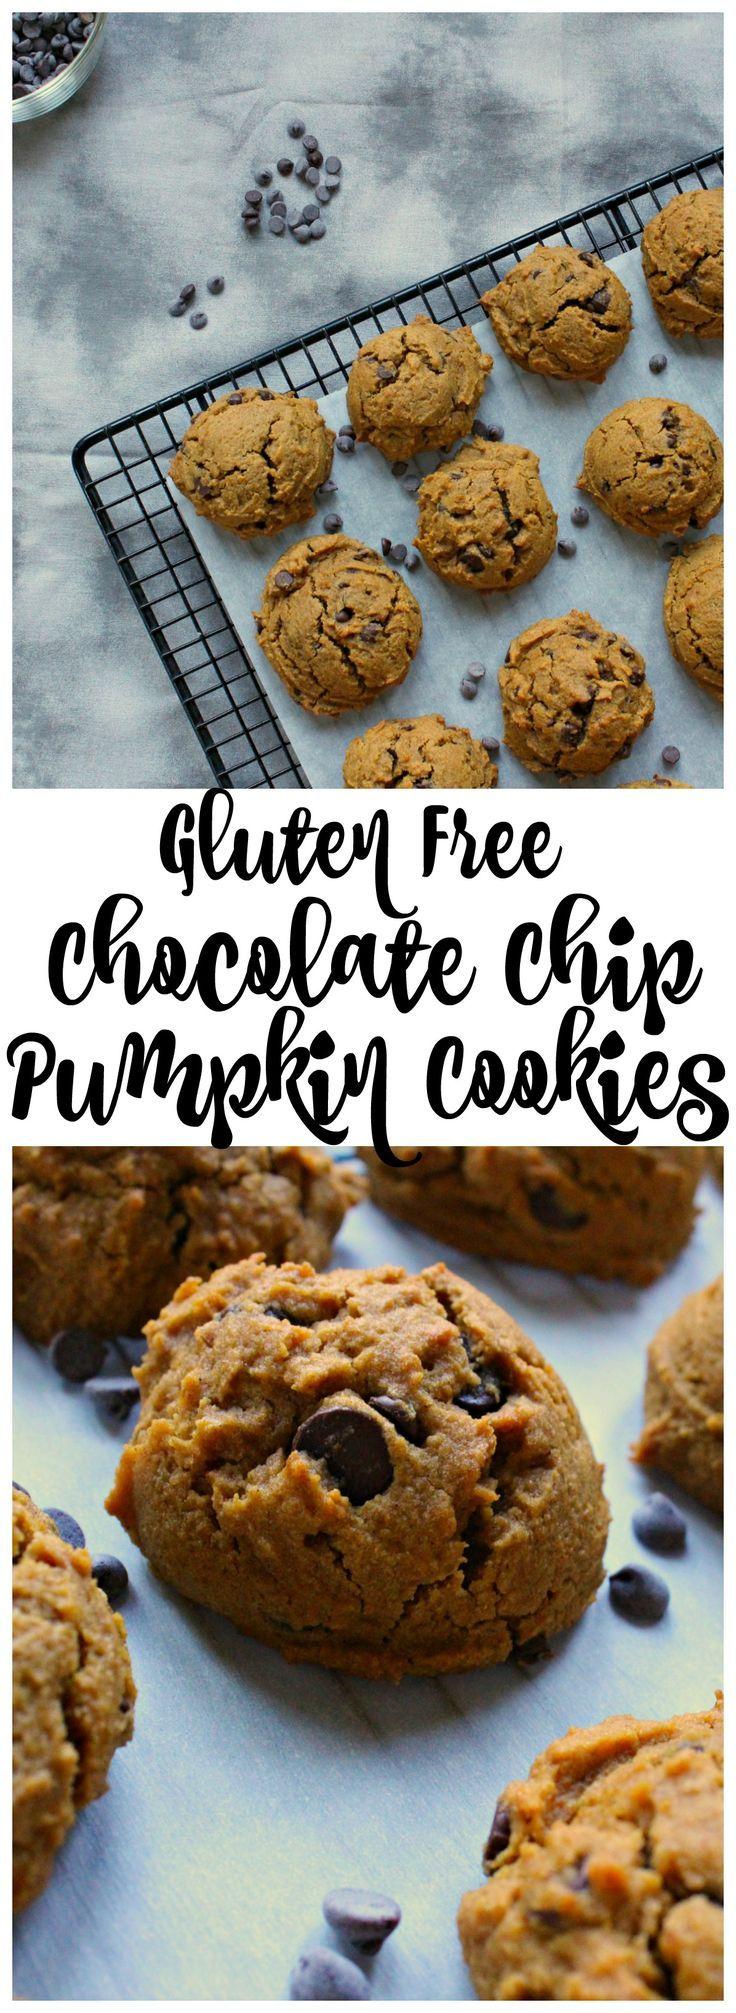 Gluten Free Chocolate Chip Pumpkin Cookies -   13 healthy recipes Gluten Free chocolate chip cookies ideas